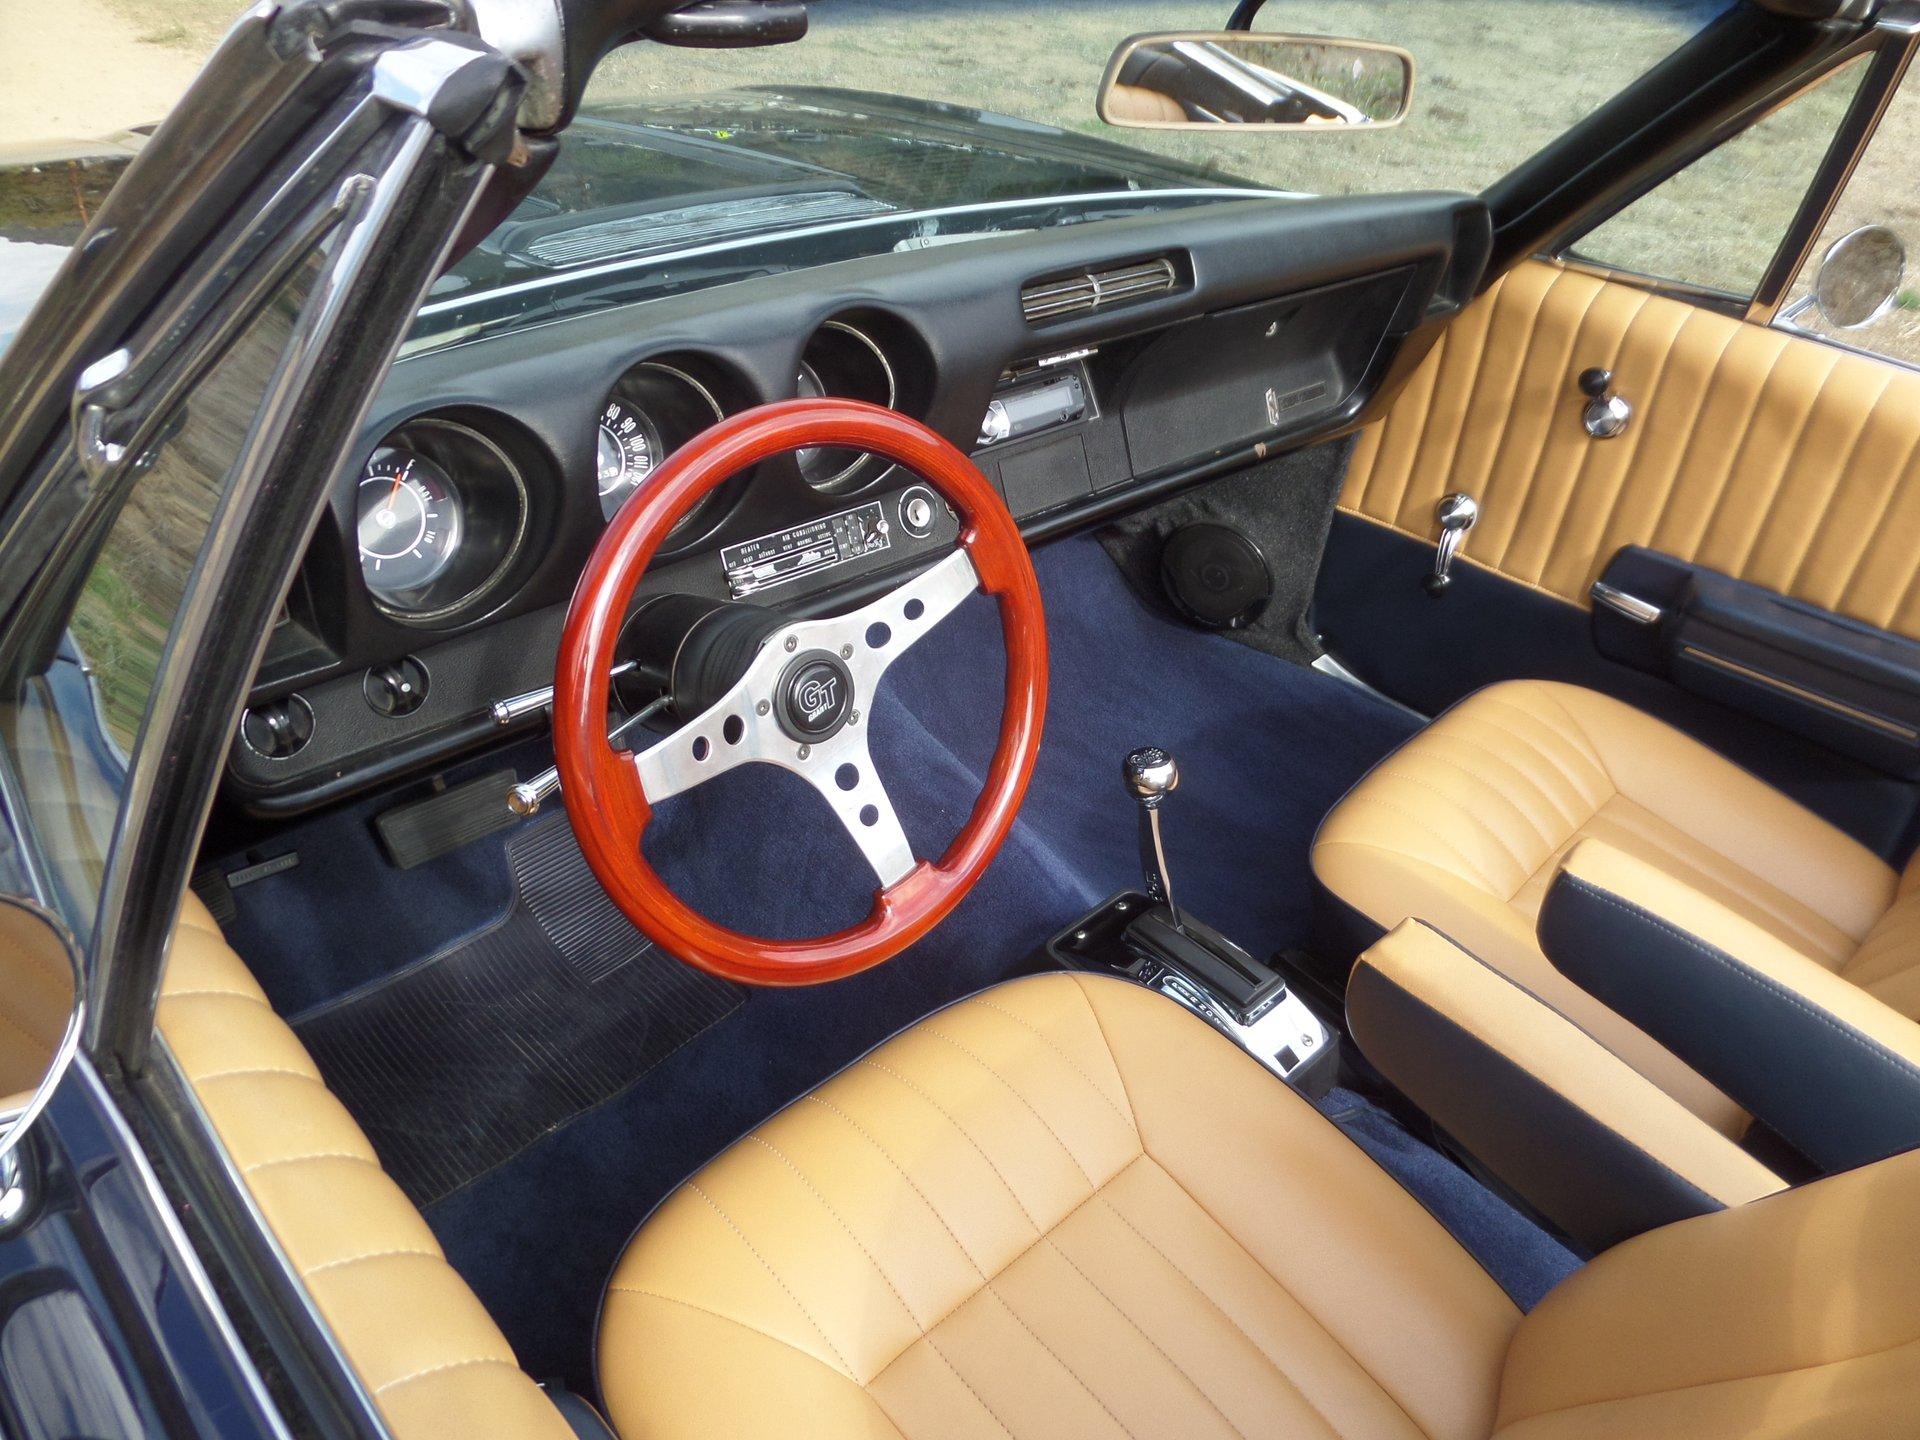 1968 Oldsmobile Cutlass | Laguna Classic Cars & Automotive Art